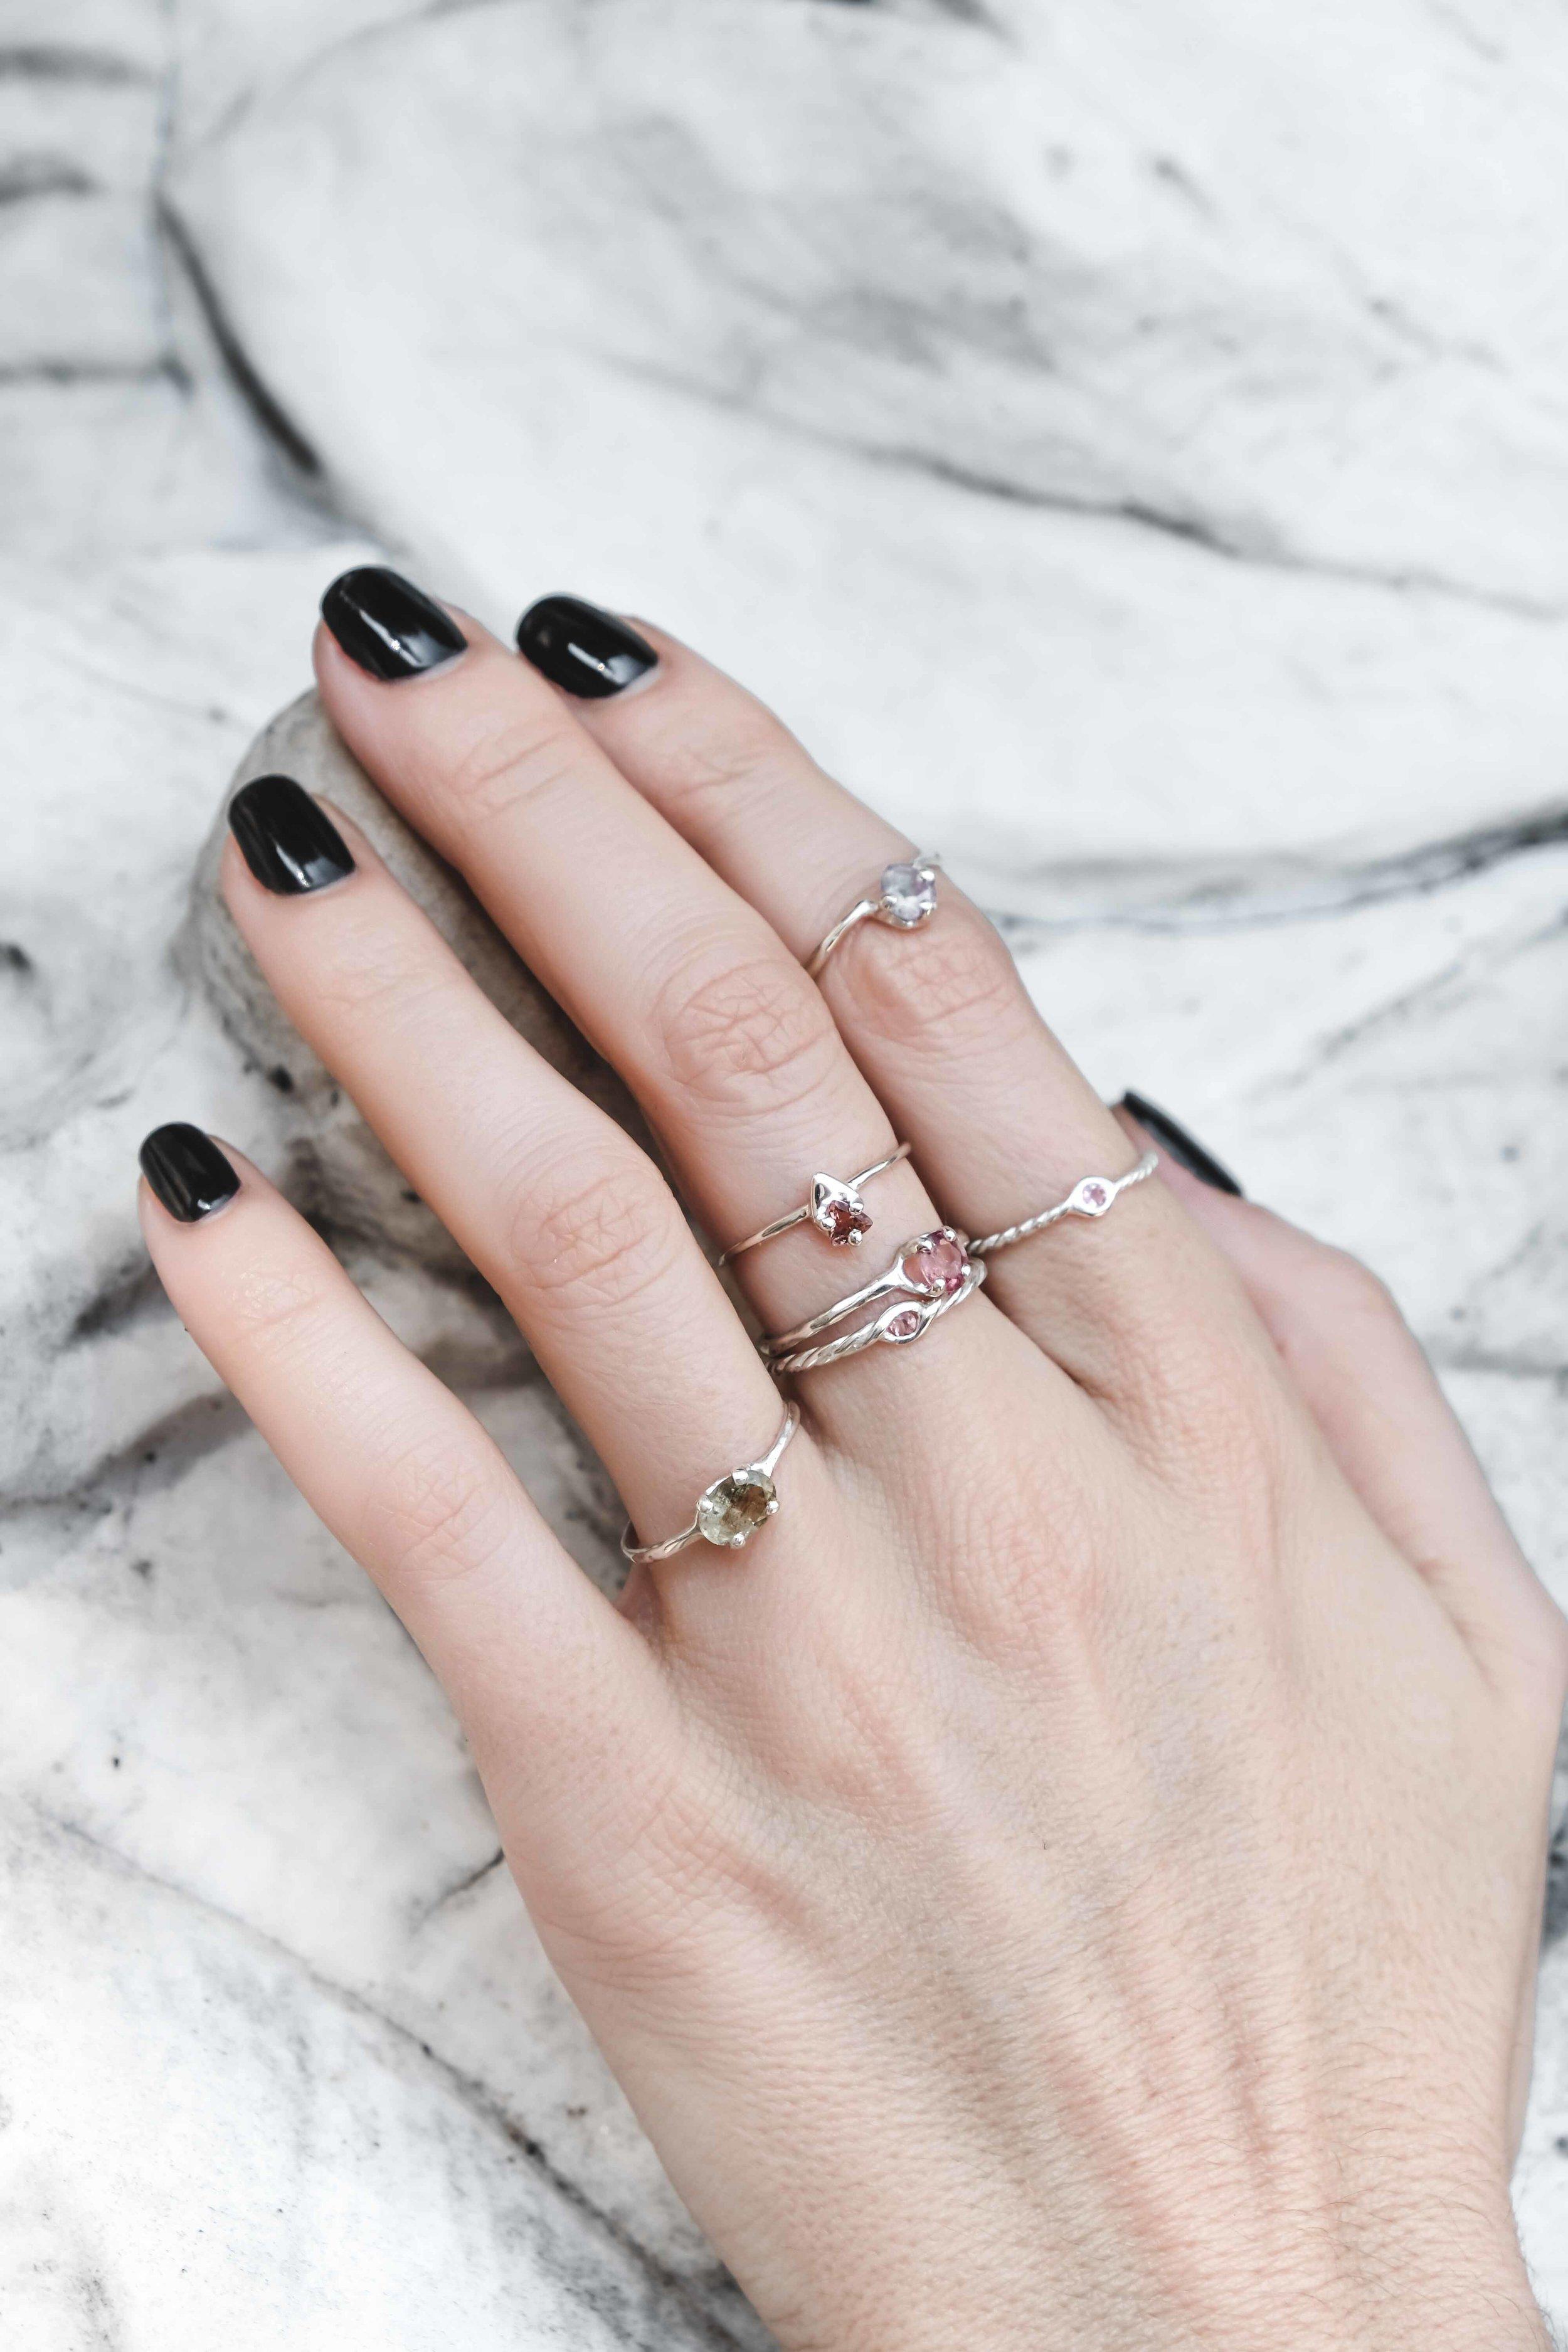 silver-jewelry-rings-tourmaline-the-black-alchemy-2.jpg